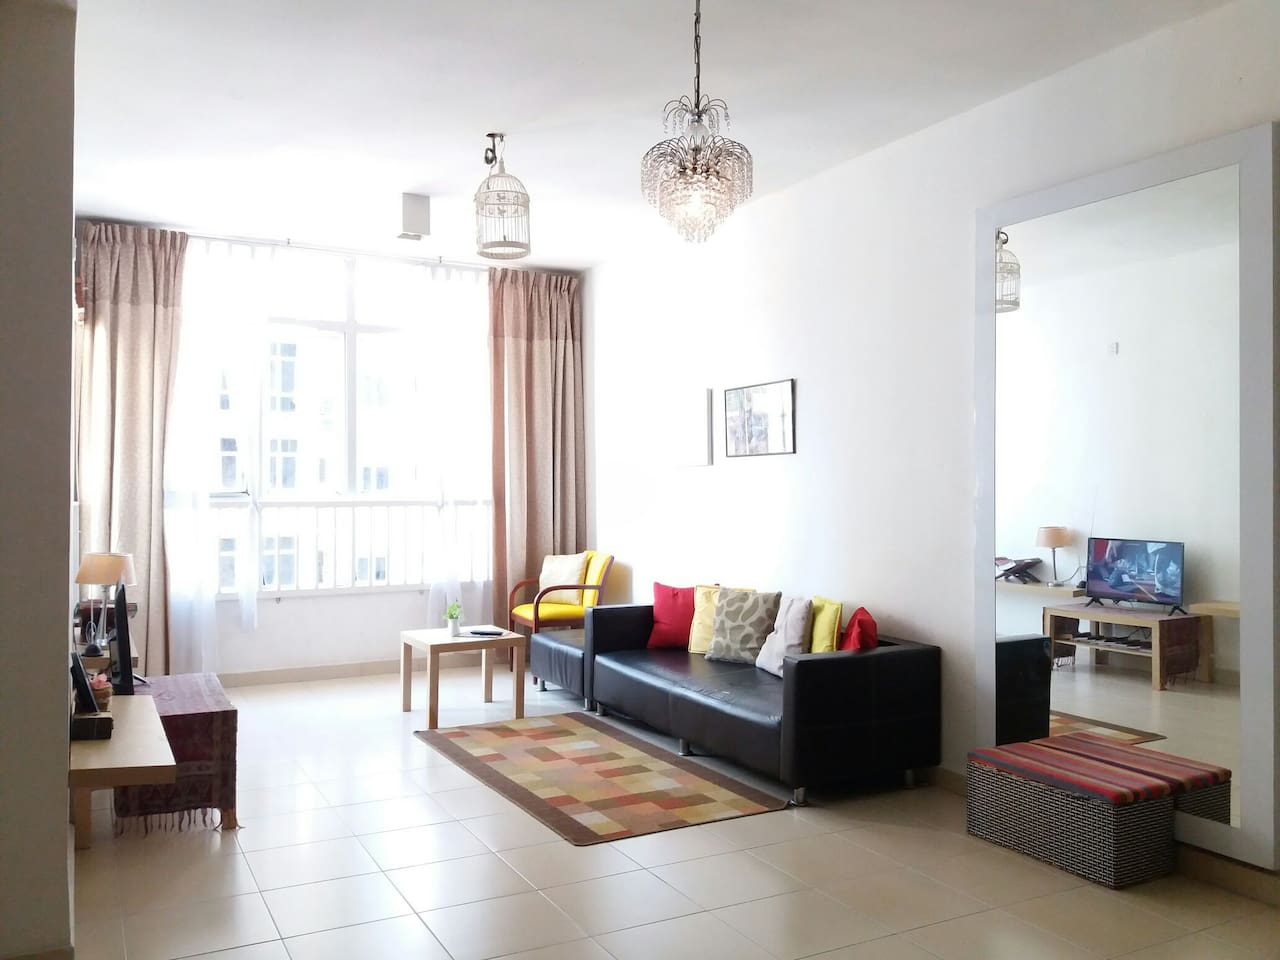 Living Room as photo taken on early Sept 2019